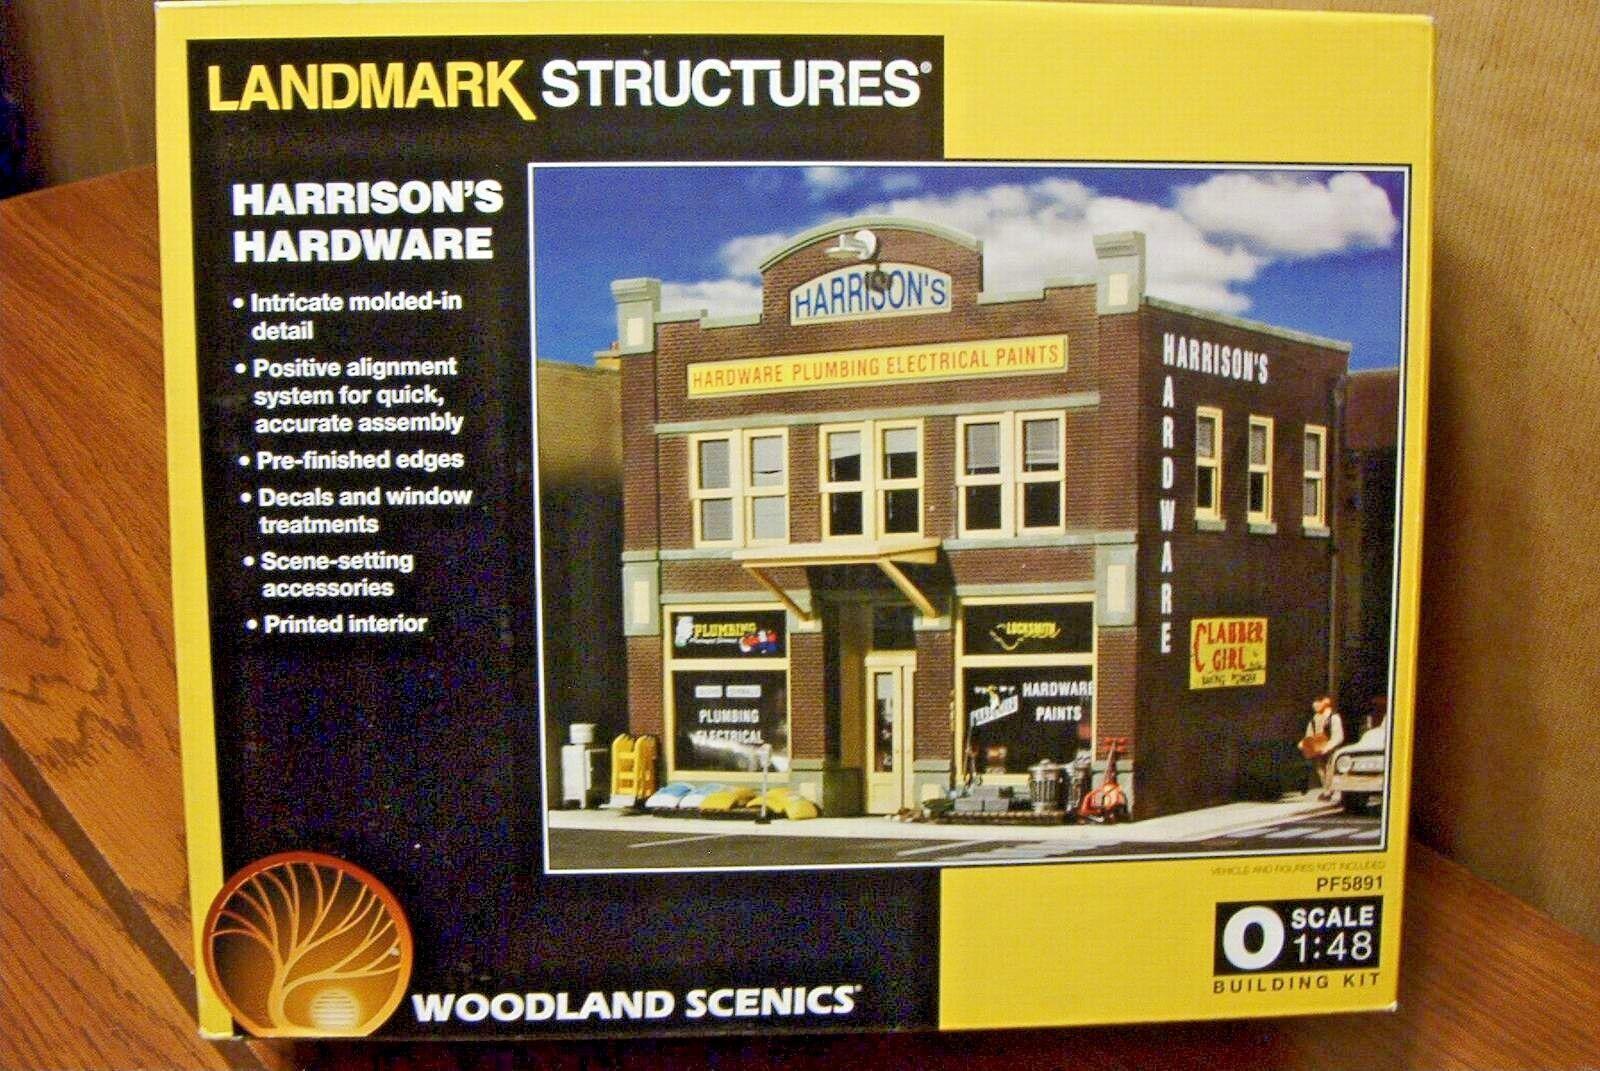 Woodland Scenics Landmark estructura Harrison's Hardware O Escala Kit De Construcción